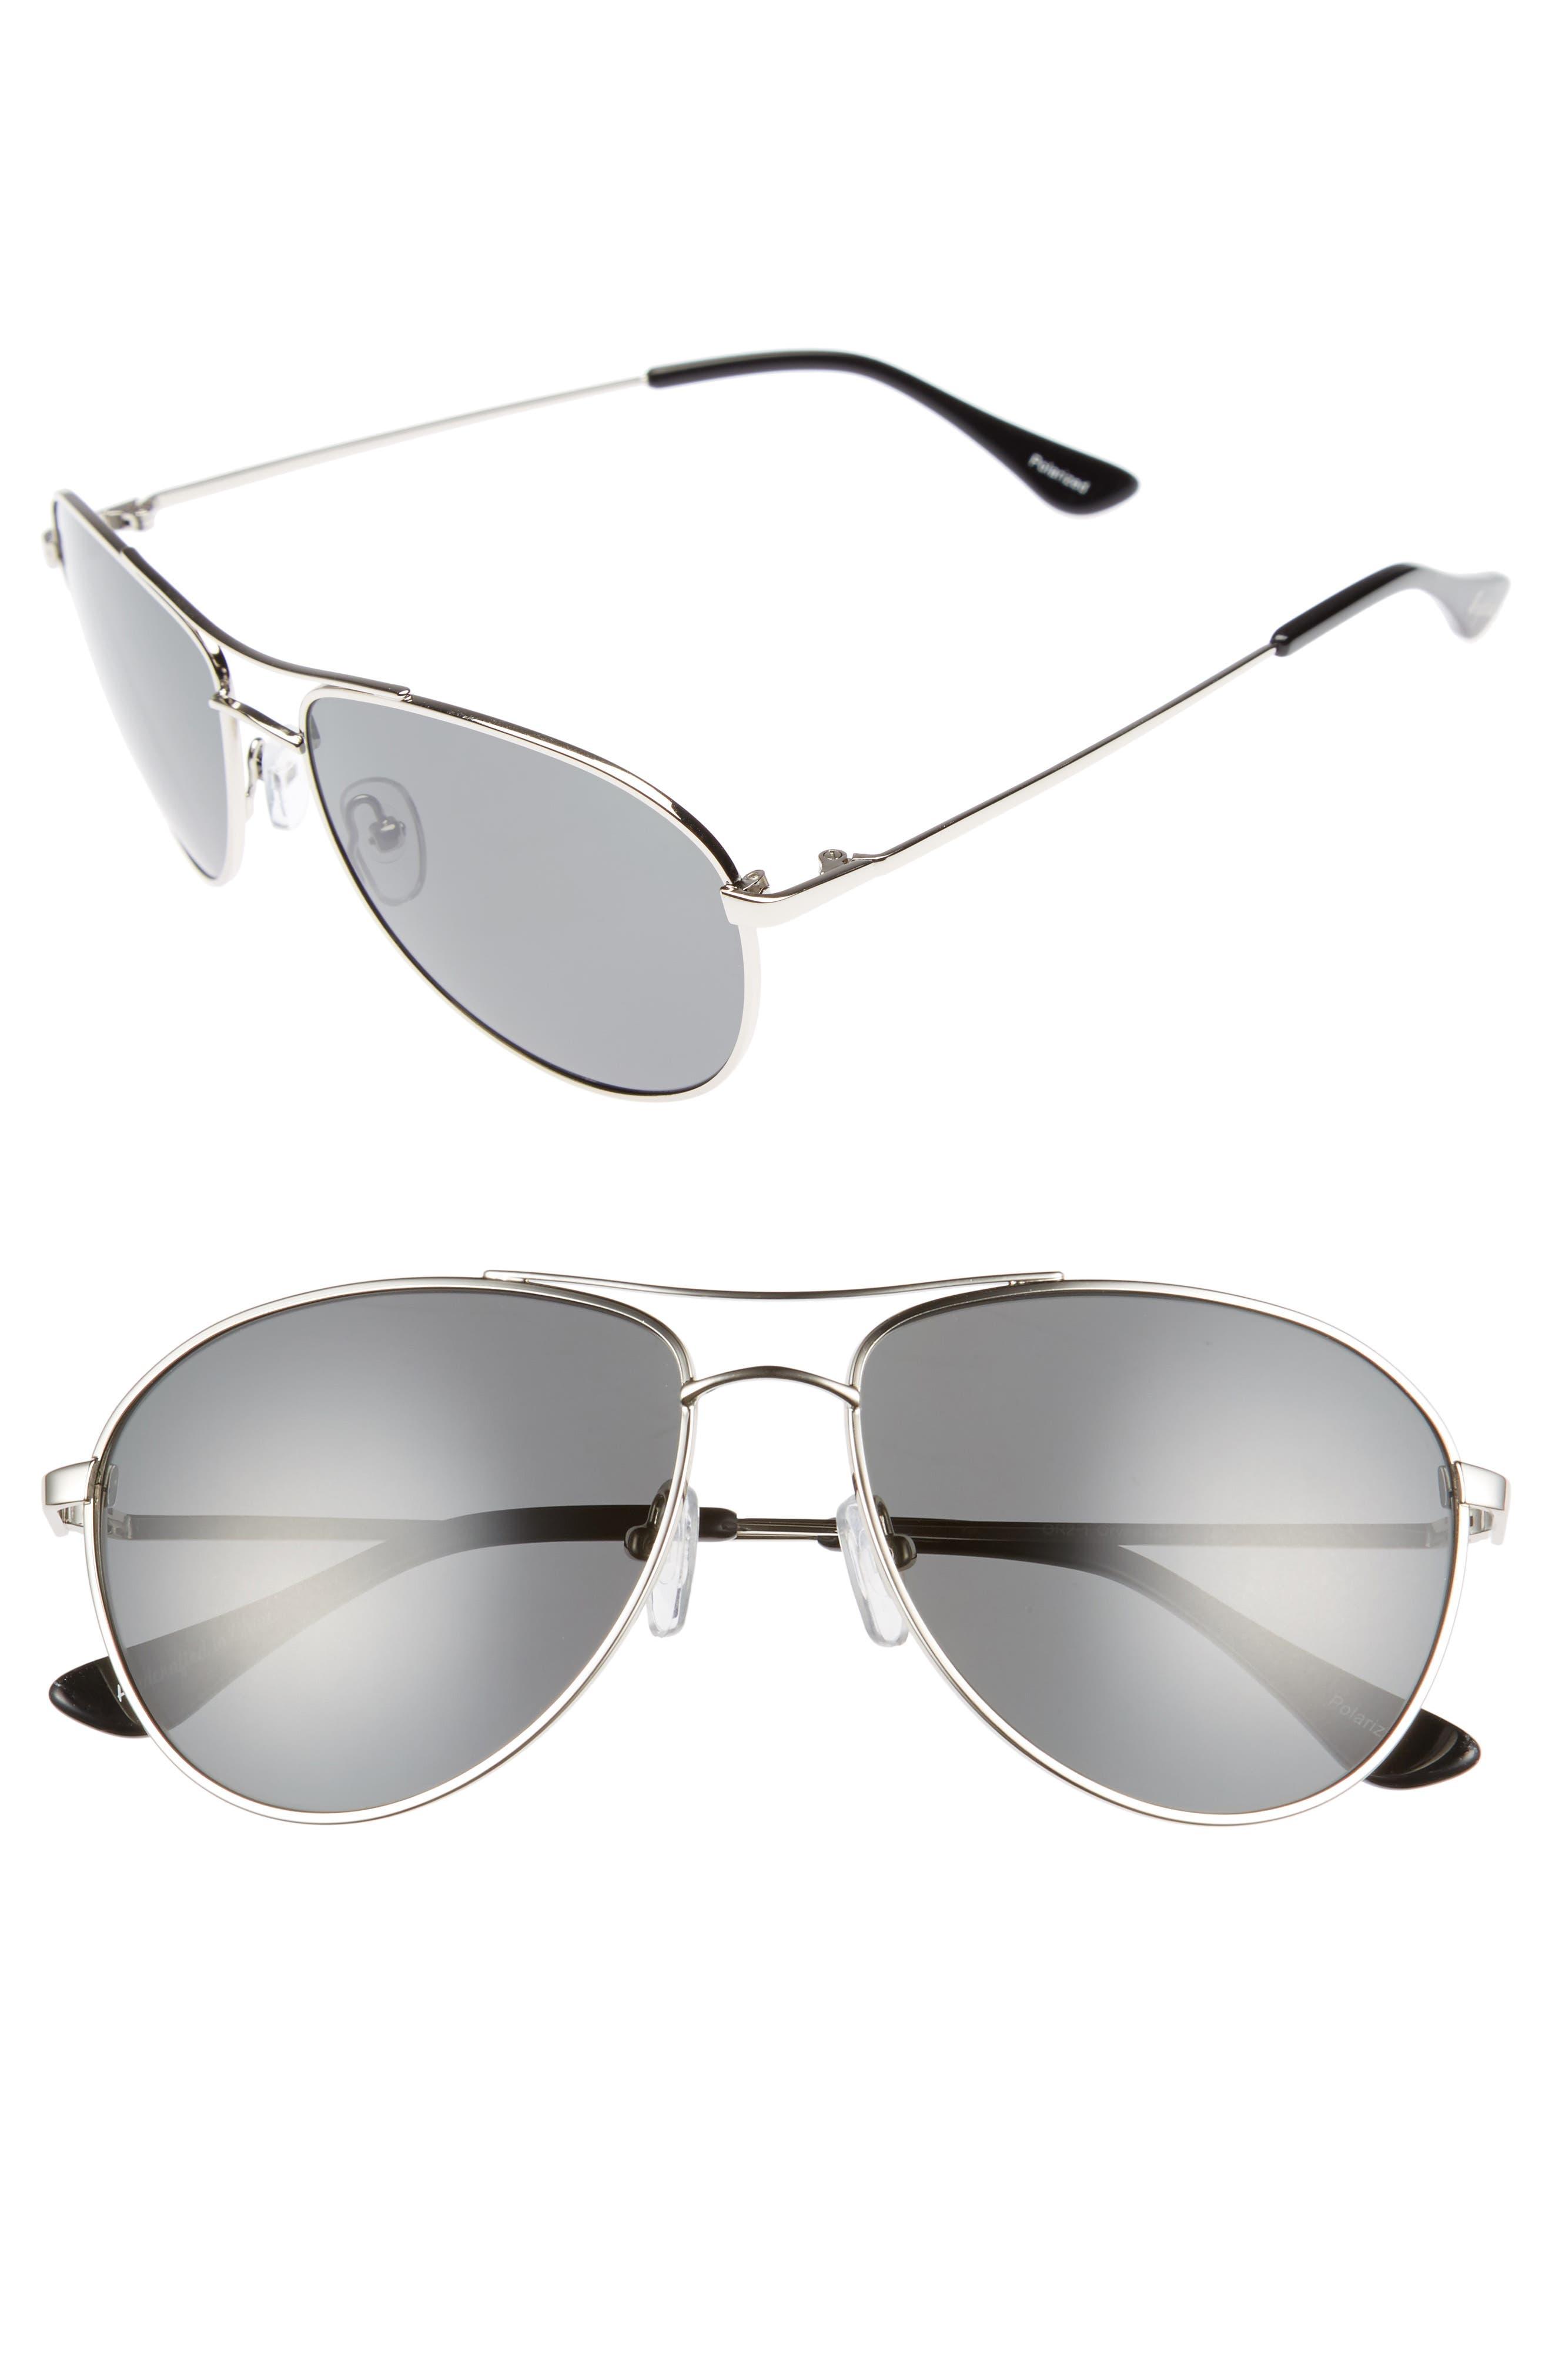 Main Image - Brightside Orville 58mm Polarized Aviator Sunglasses